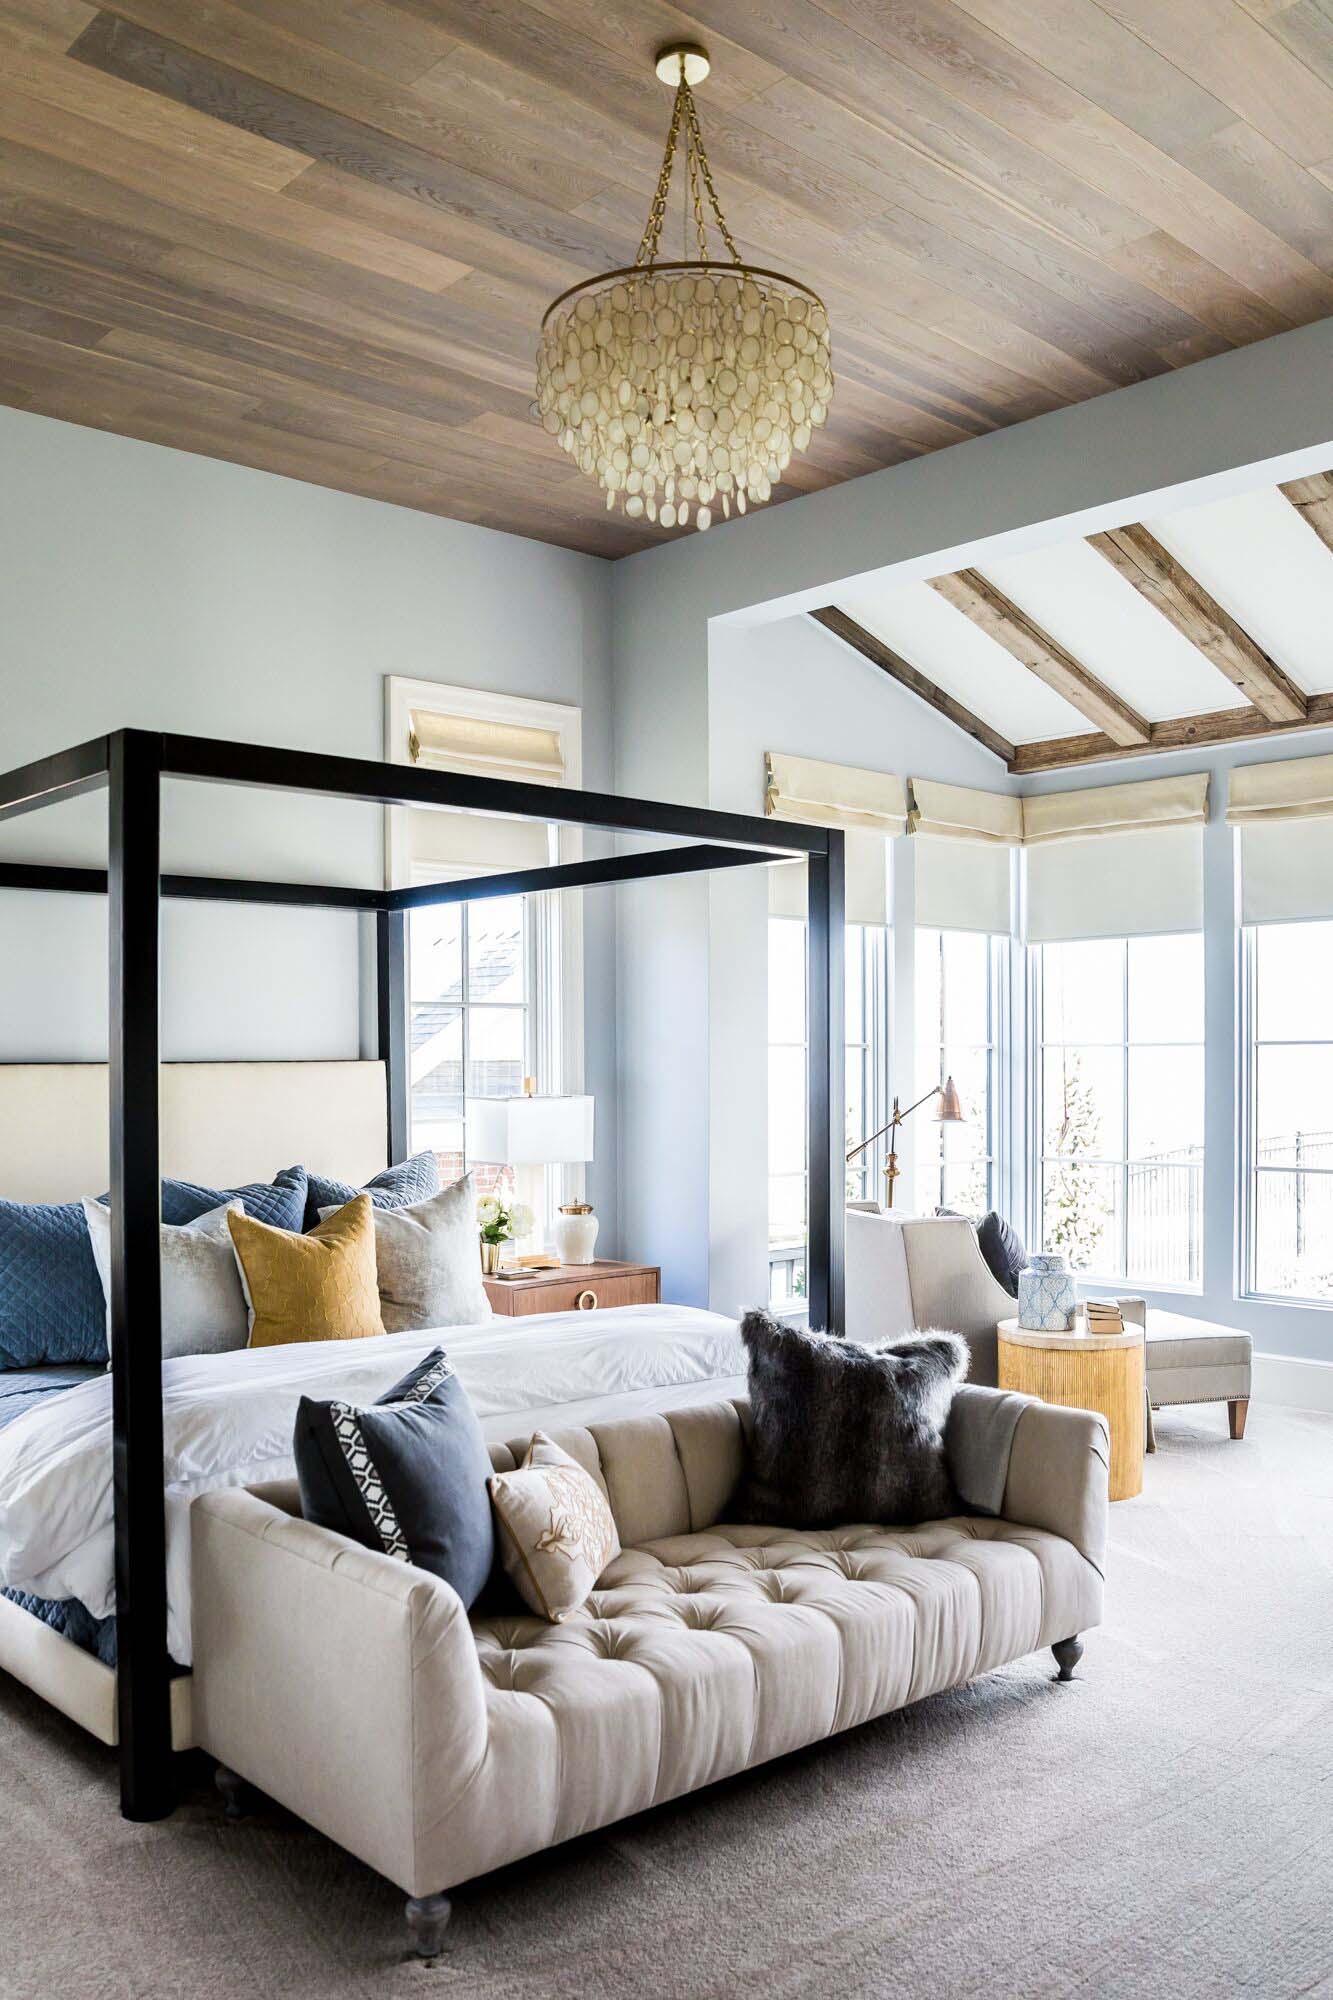 cama doble con marco moderno, habitación con paredes en azul claro, techo de parquet, lámpara original